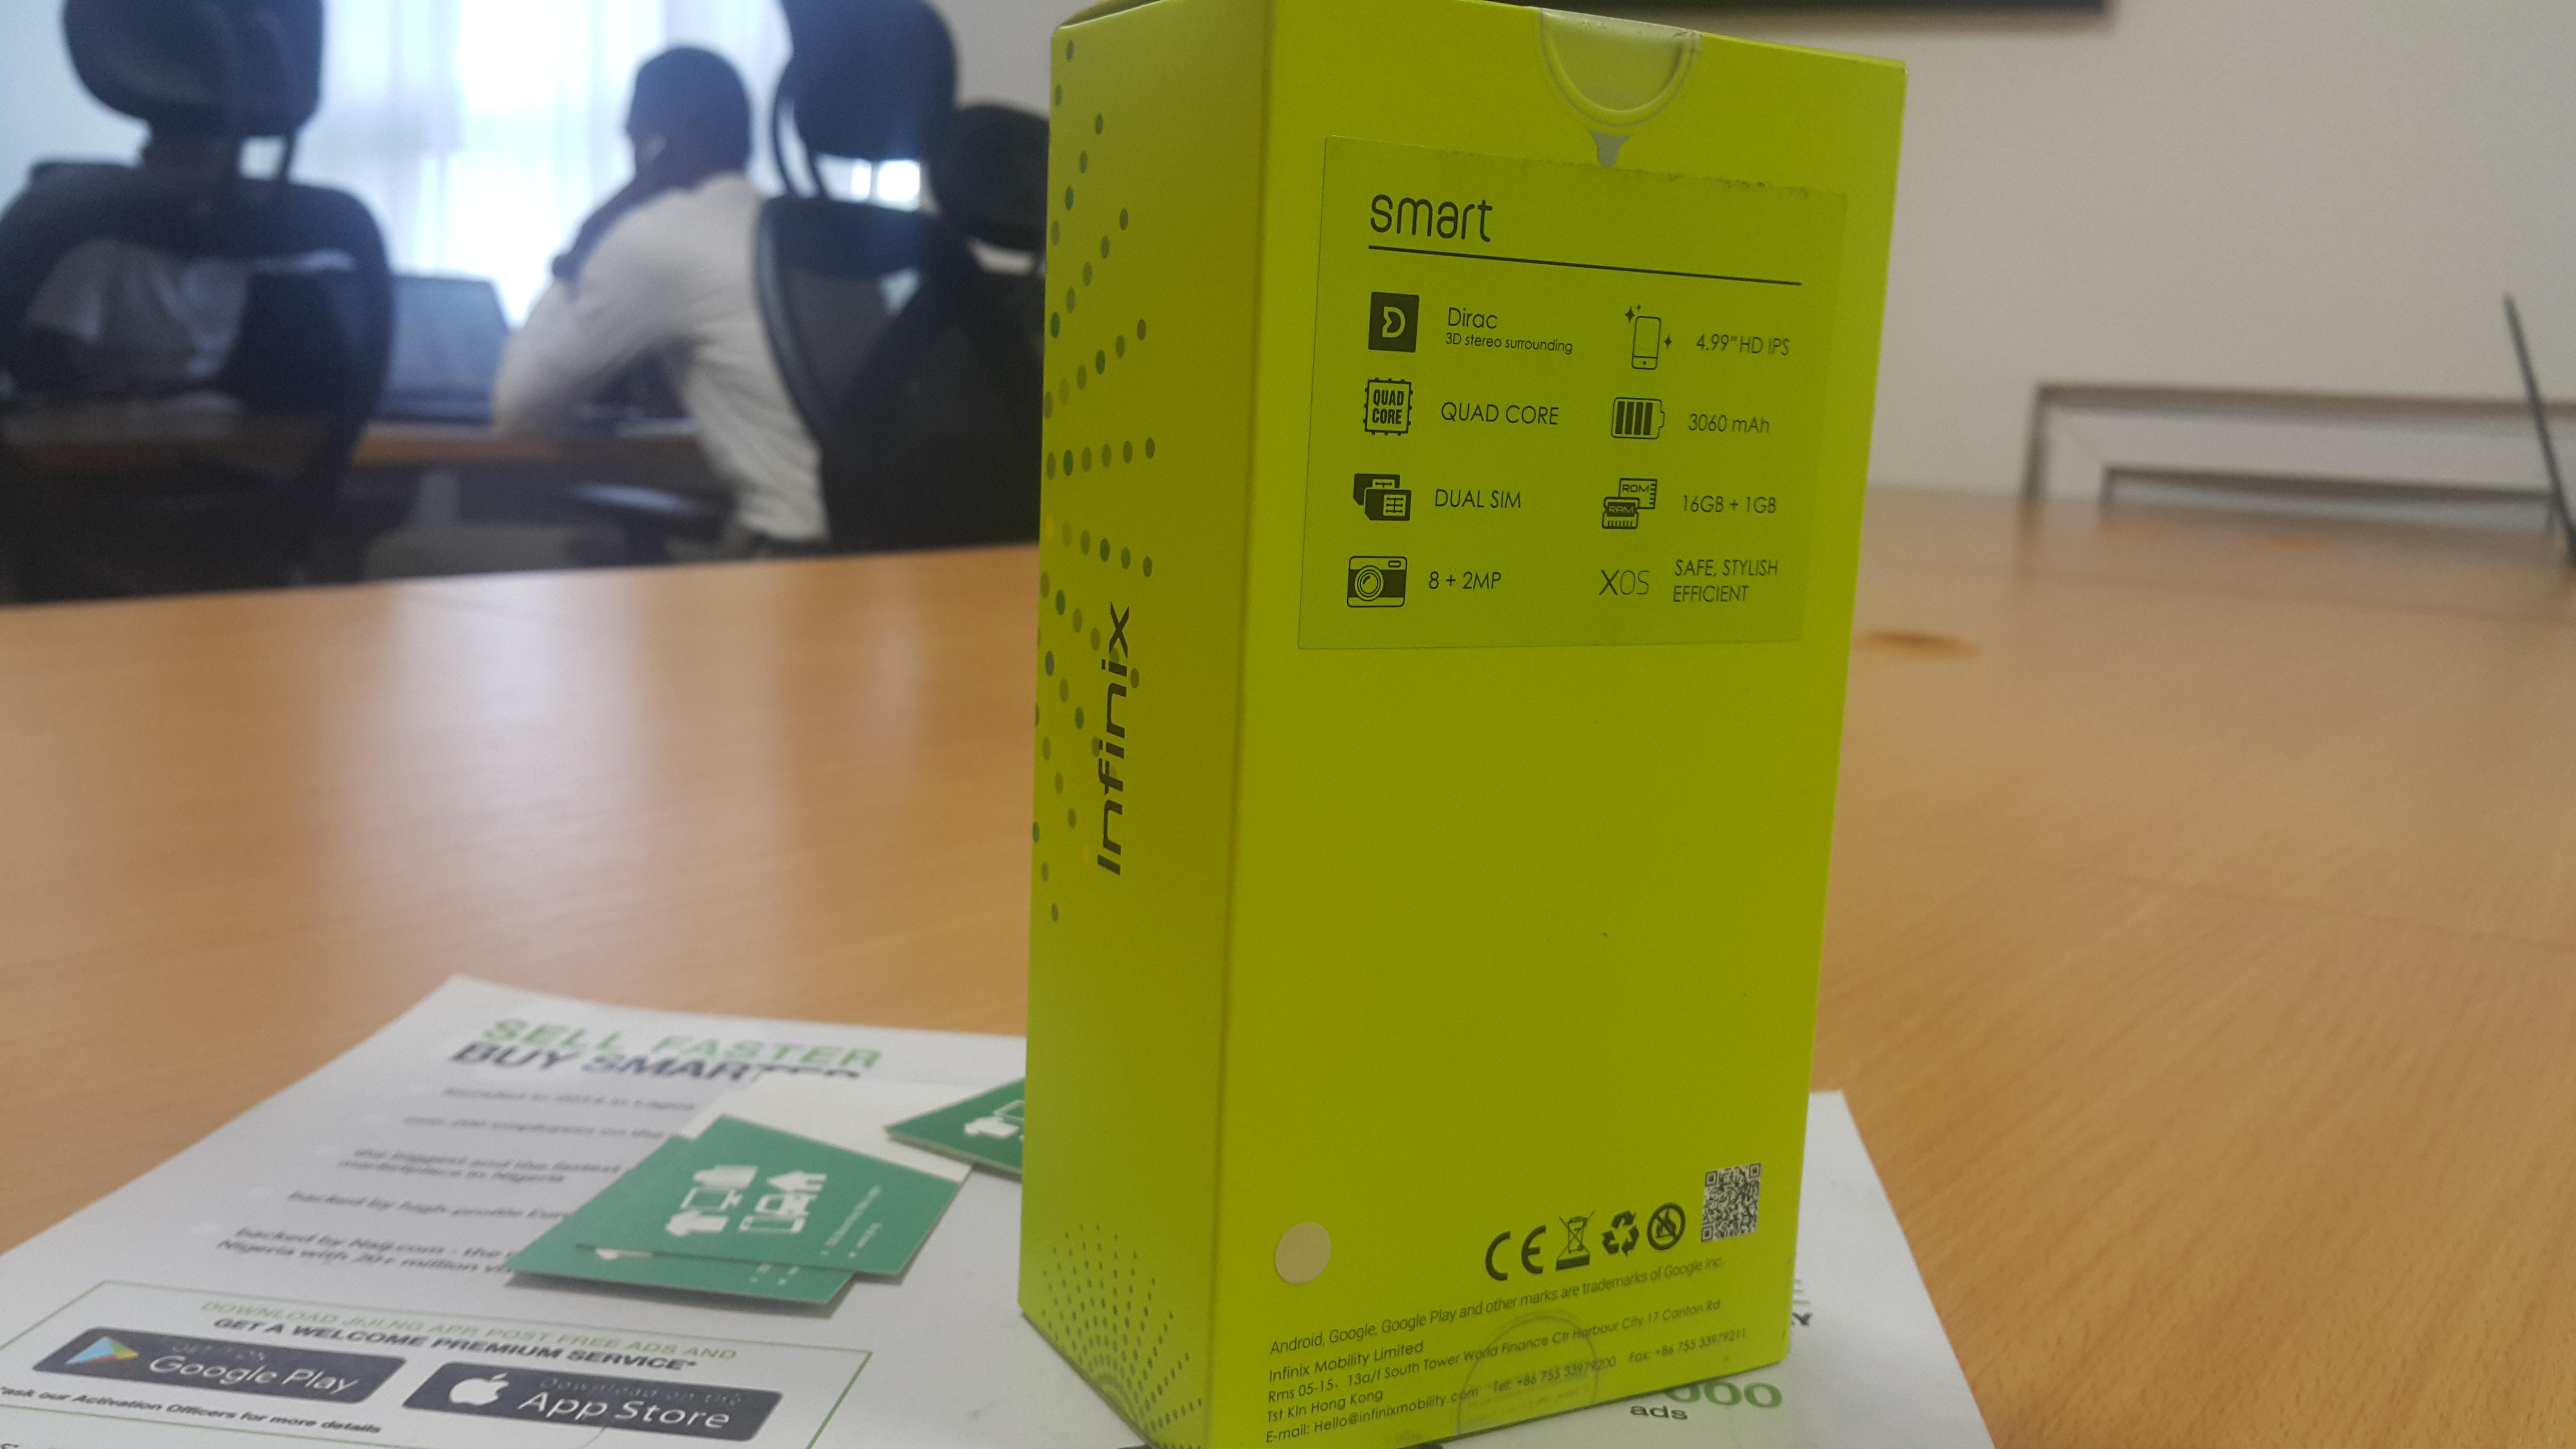 Infinix Smart price in Nigeria